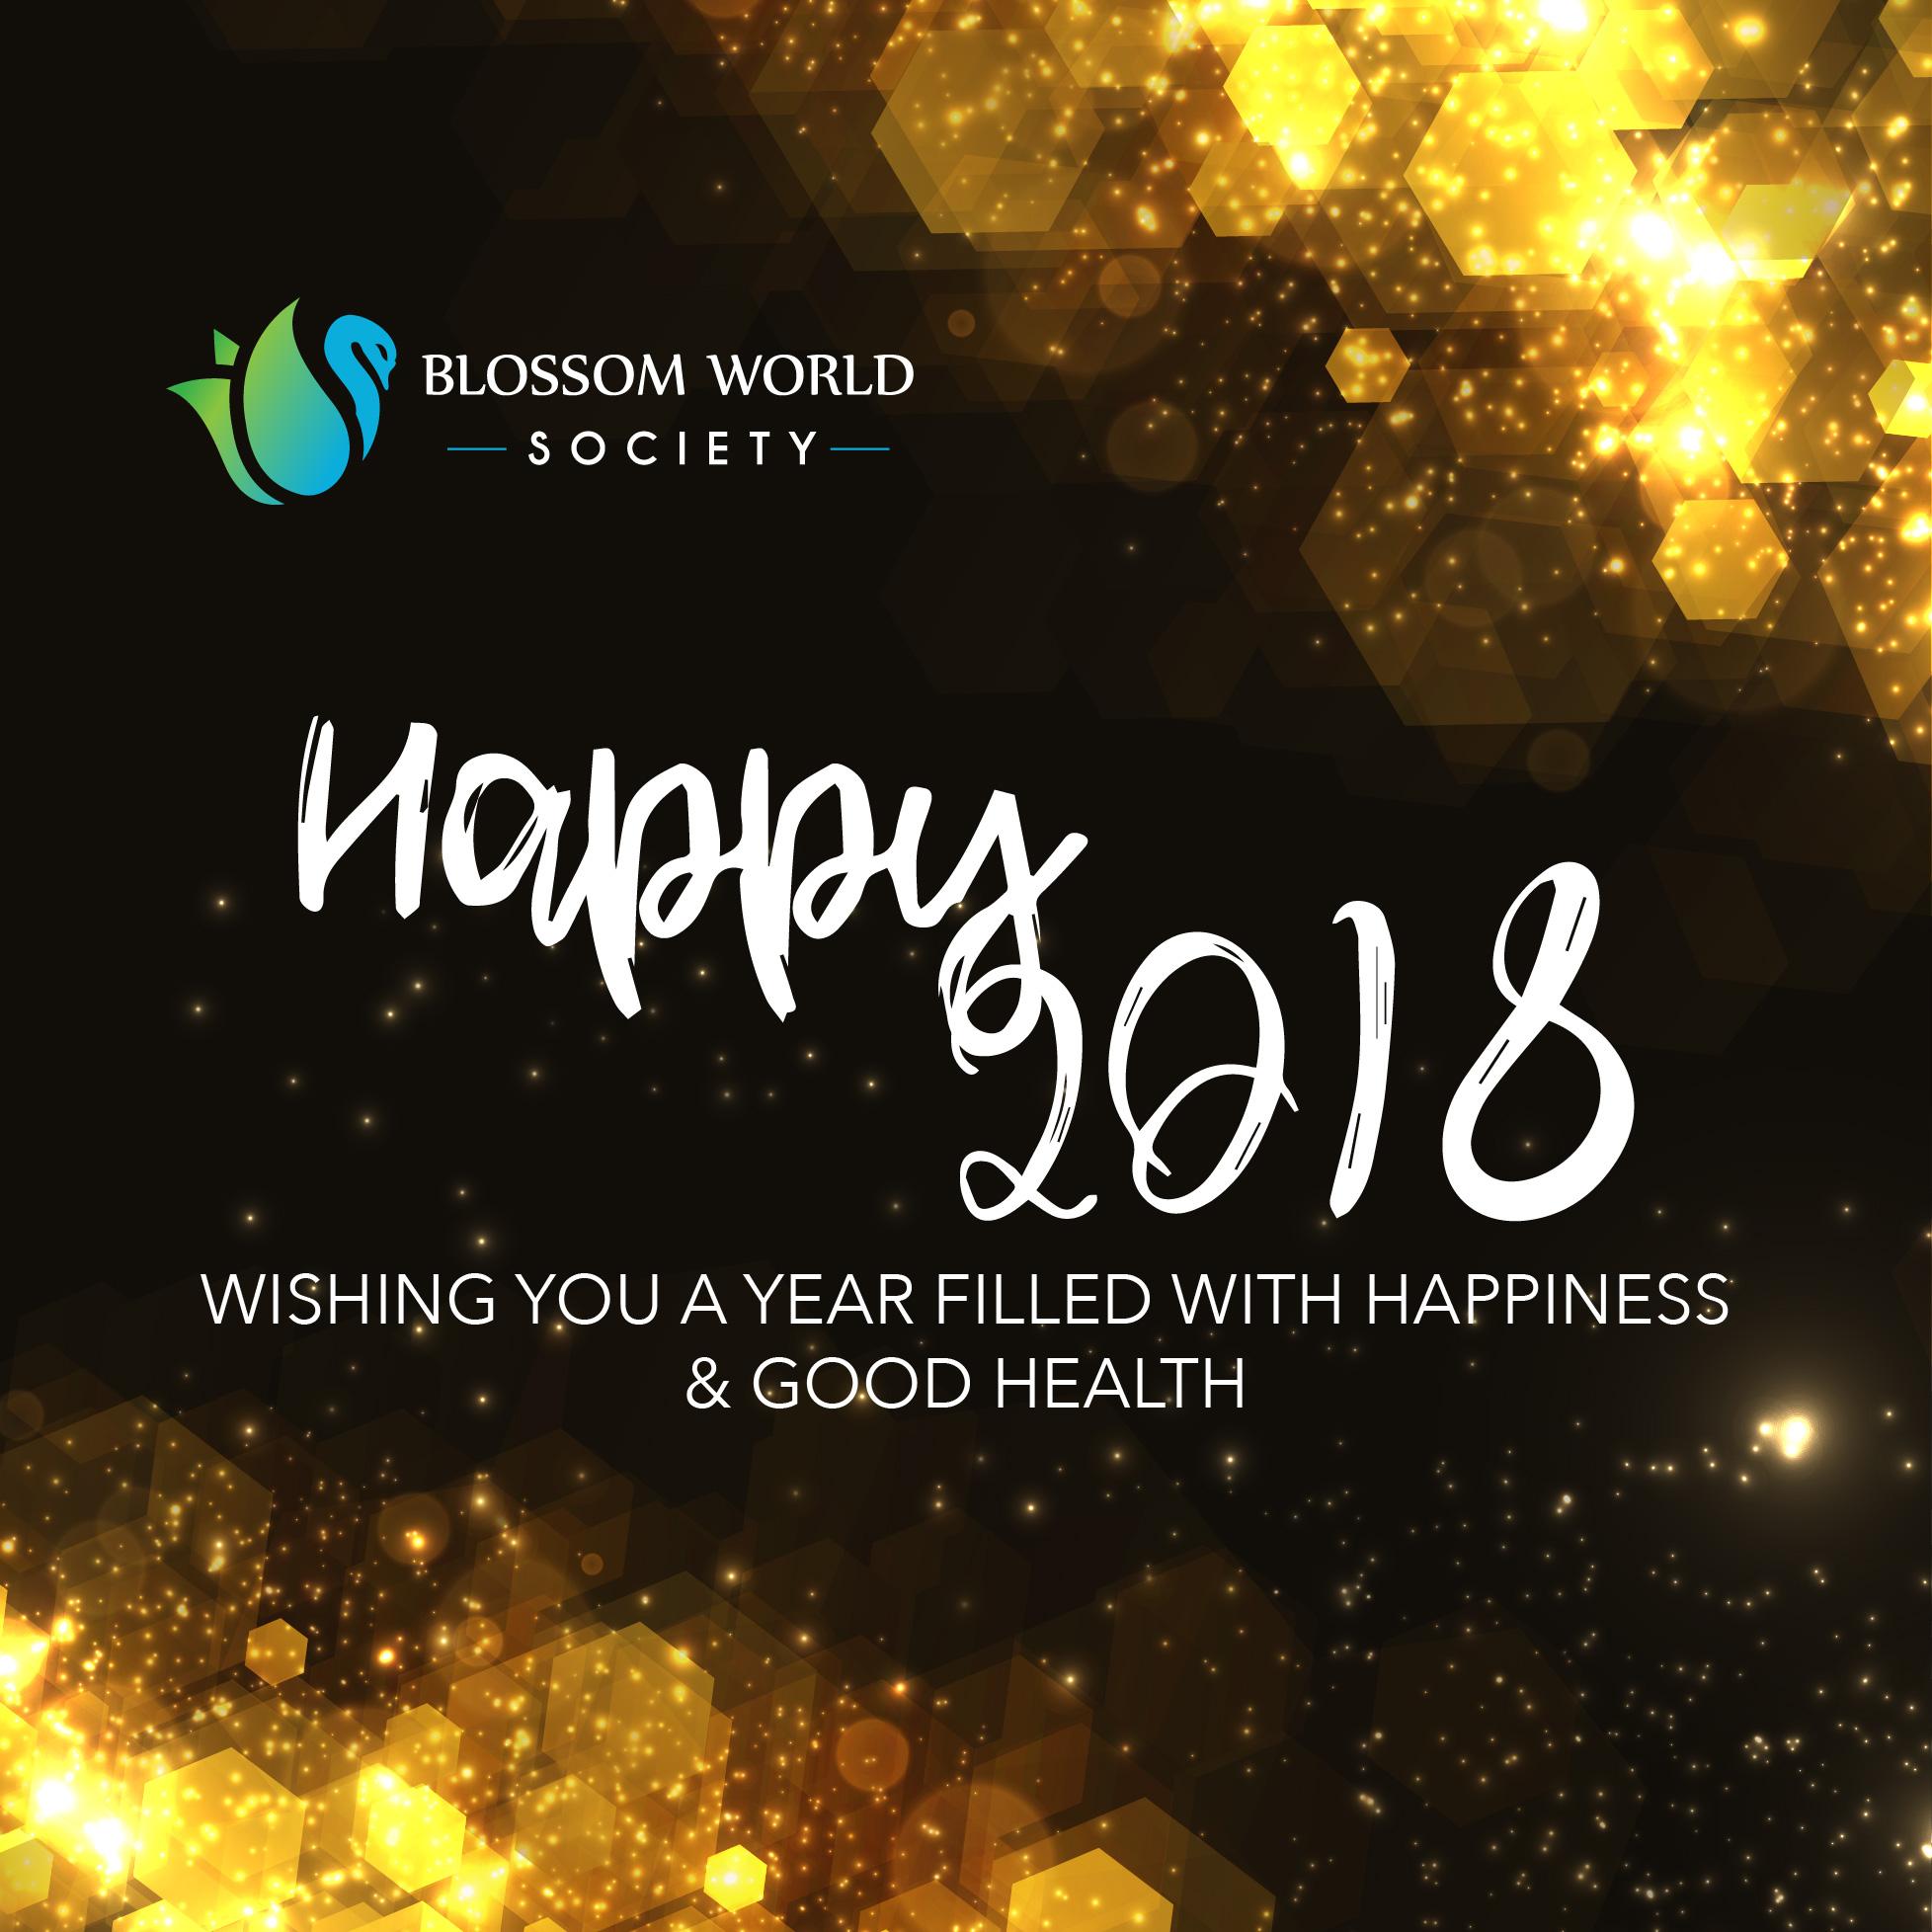 happy2018-sq-02.jpg